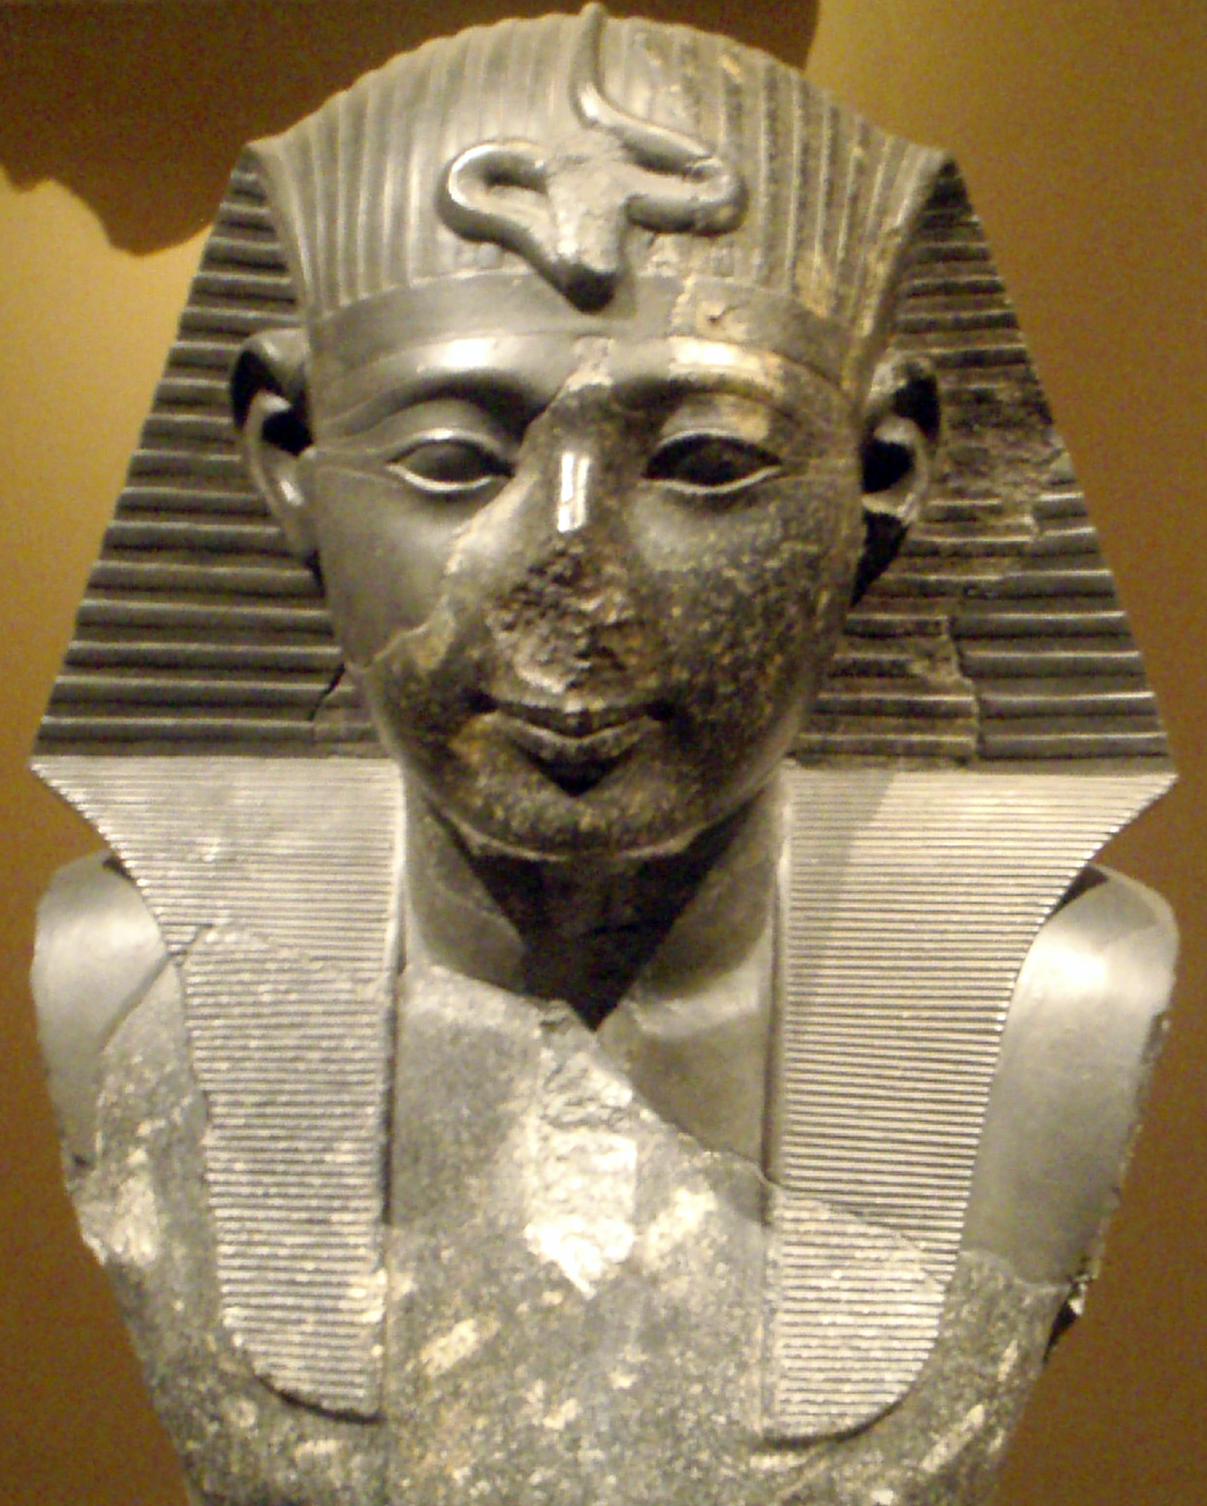 setii-kneelingstatueofferingtoosiris-closeup metropolitanmuseum.png